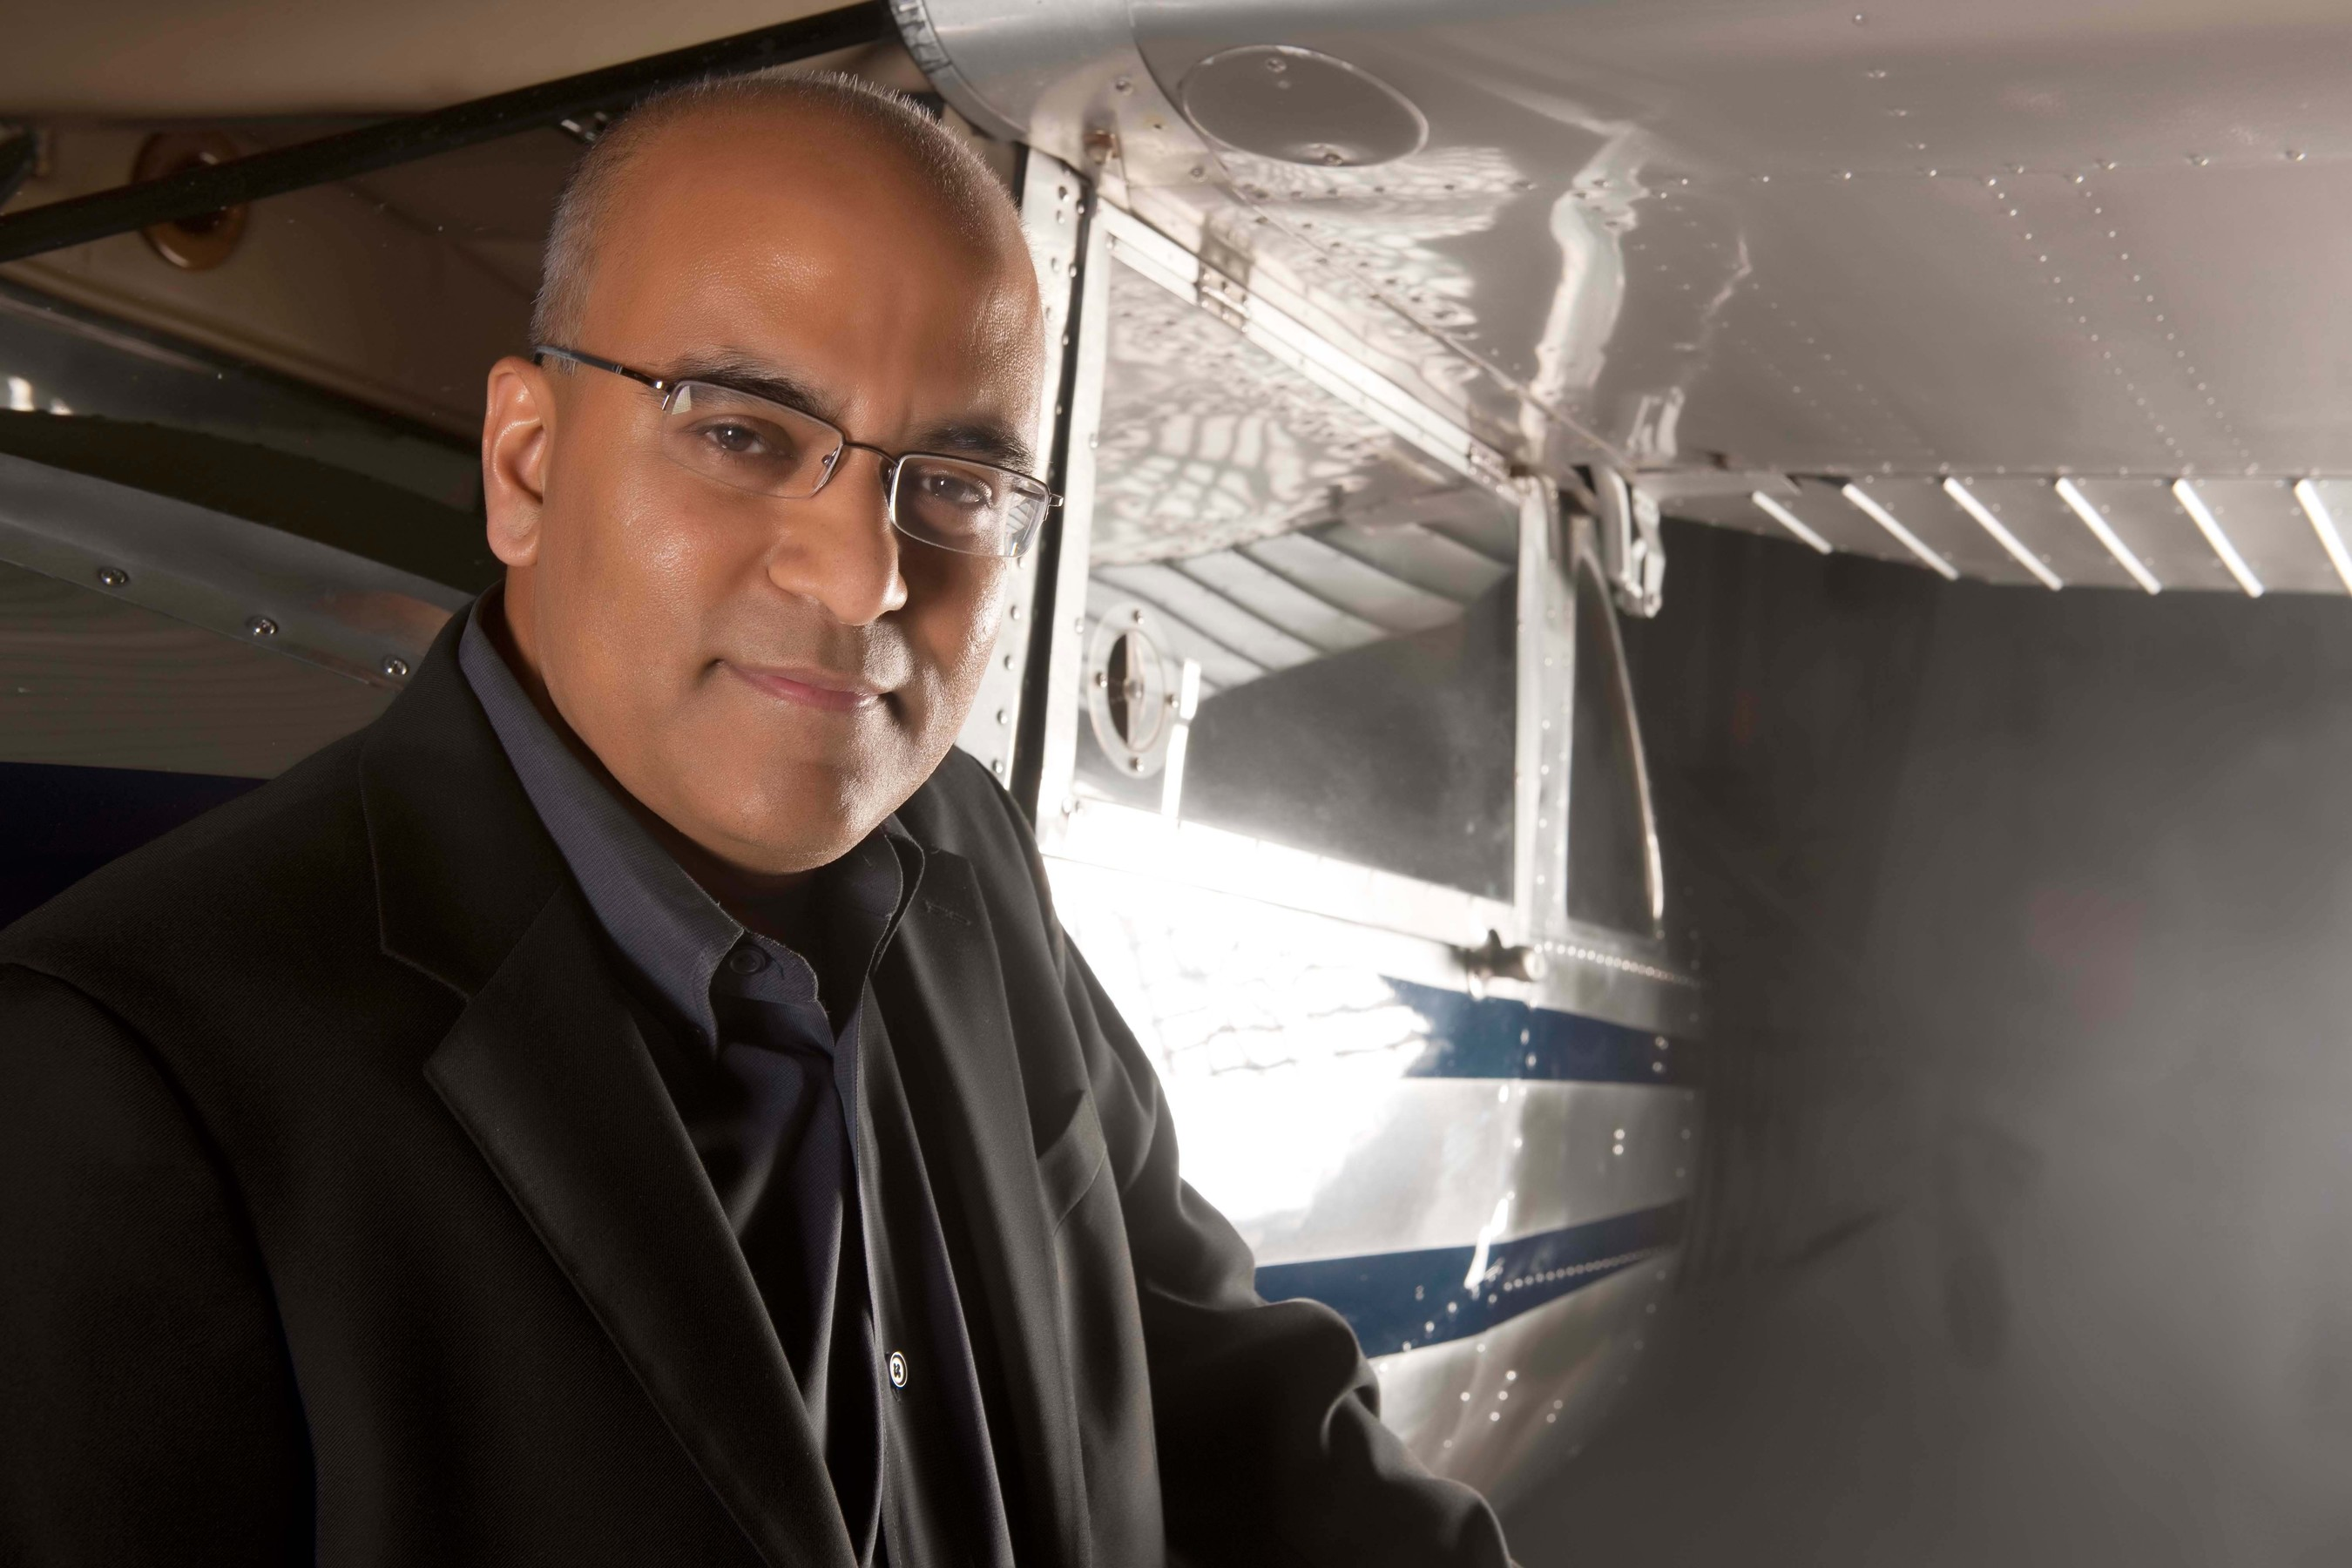 Vinay Nilkanth, vice president of global sales, aerospace, Freudenberg-NOK. (PRNewsFoto/Freudenberg-NOK Sealing Technologies) (PRNewsFoto/FREUDENBERG-NOK SEALING TECH...)